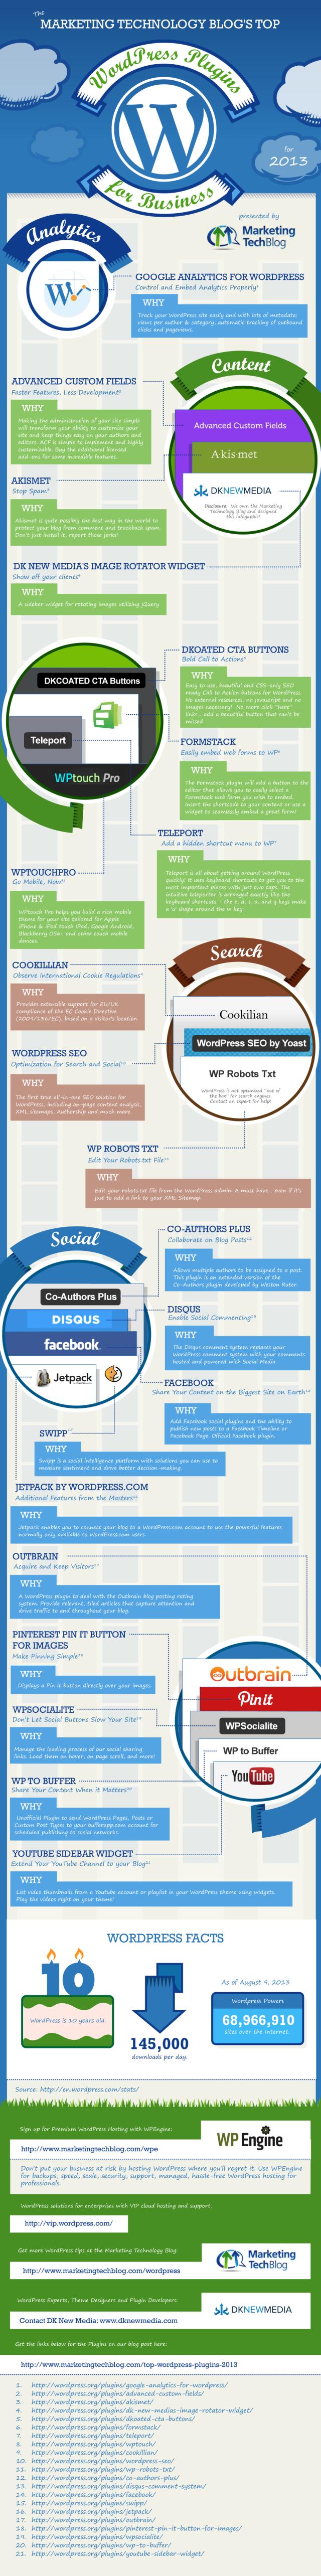 Los 21 mejores plugins para WordPress 2013